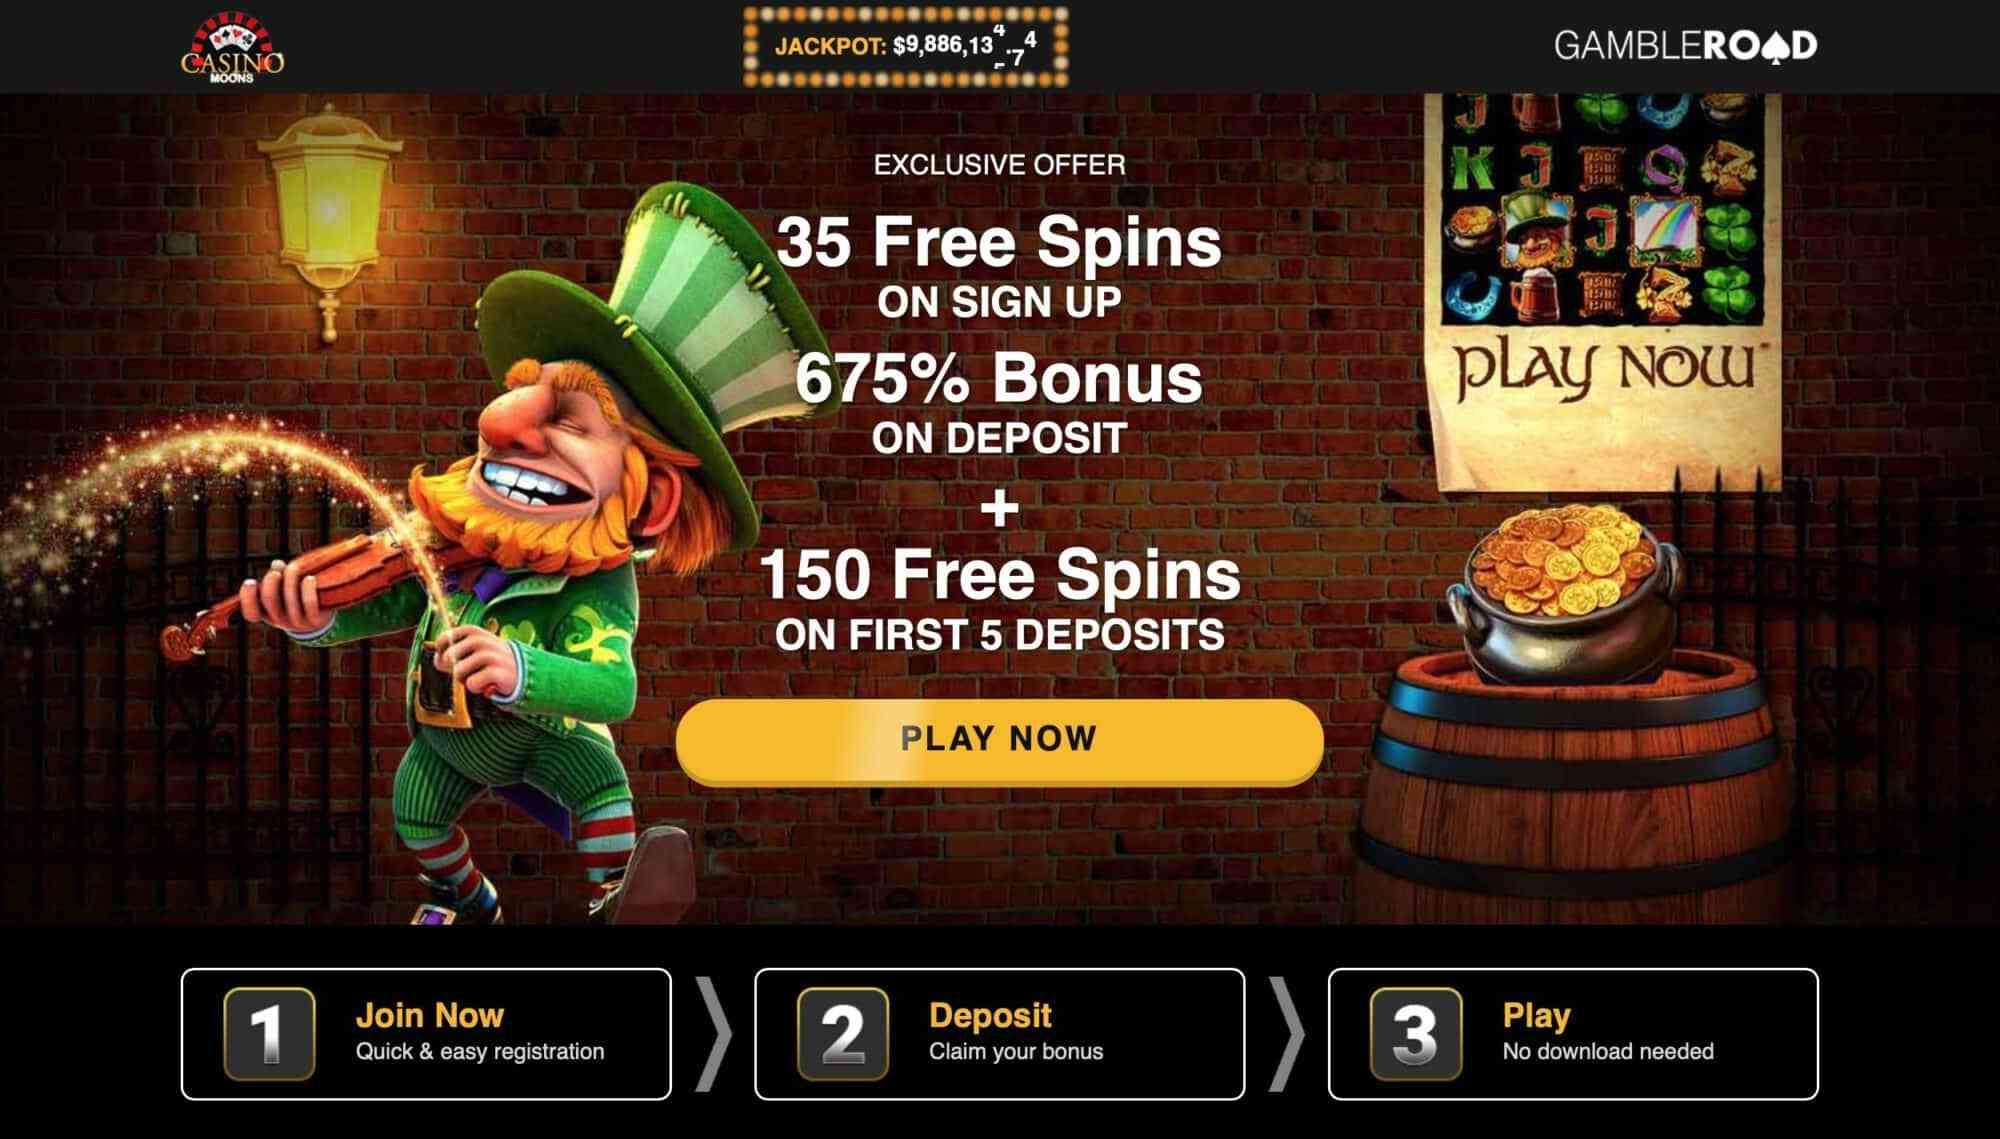 Casino Moons - Get 33 Free Spins + 675% Deposit Bonus